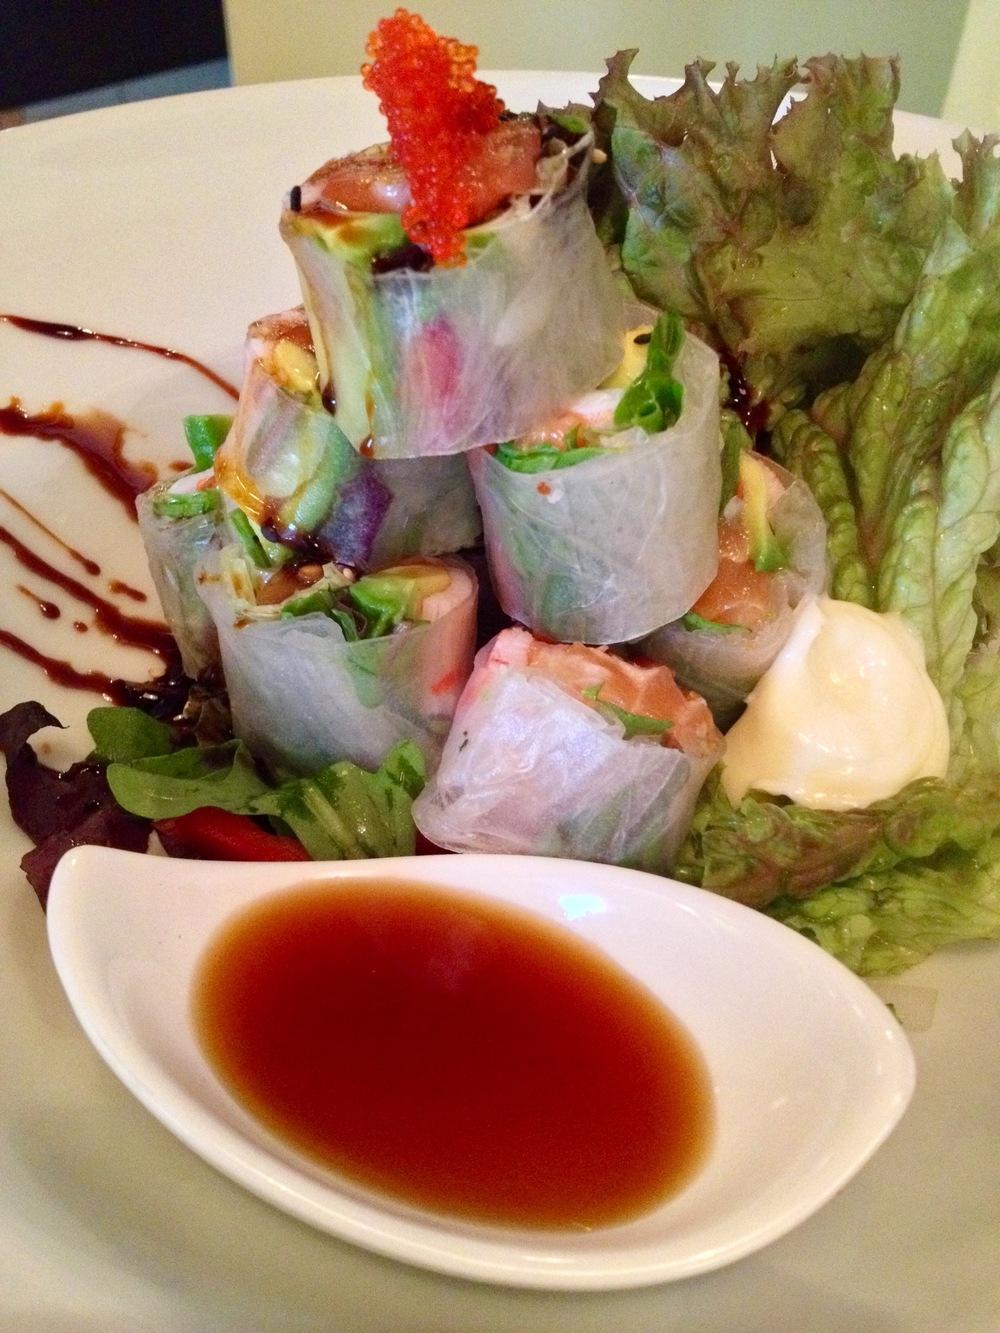 The fresh Harumaki appetizer